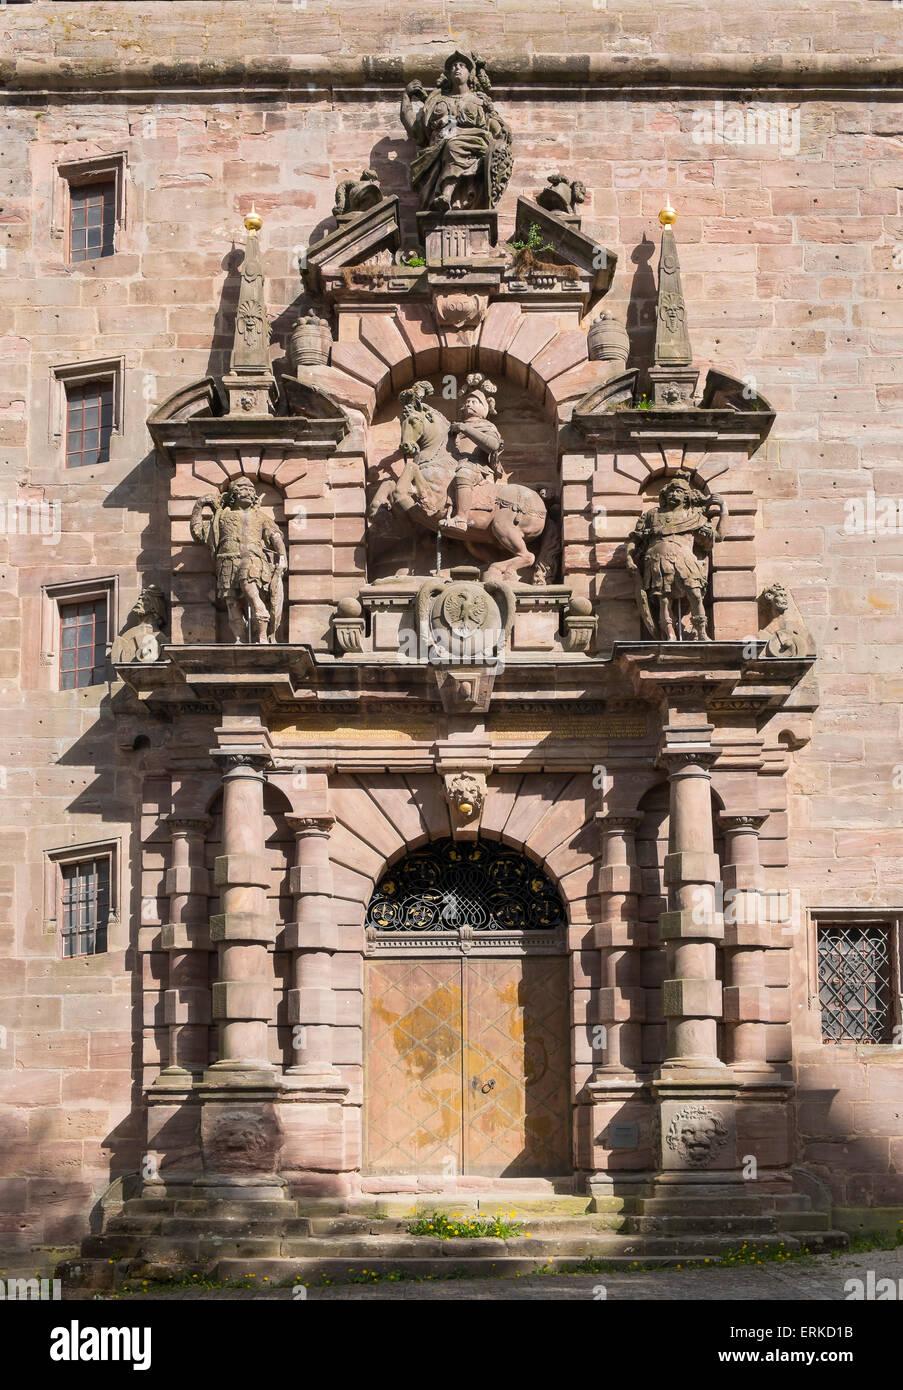 Christian's portal in the barrack, Plassenburg, Kulmbach, Upper Franconia, Franconia, Bavaria, Germany - Stock Image